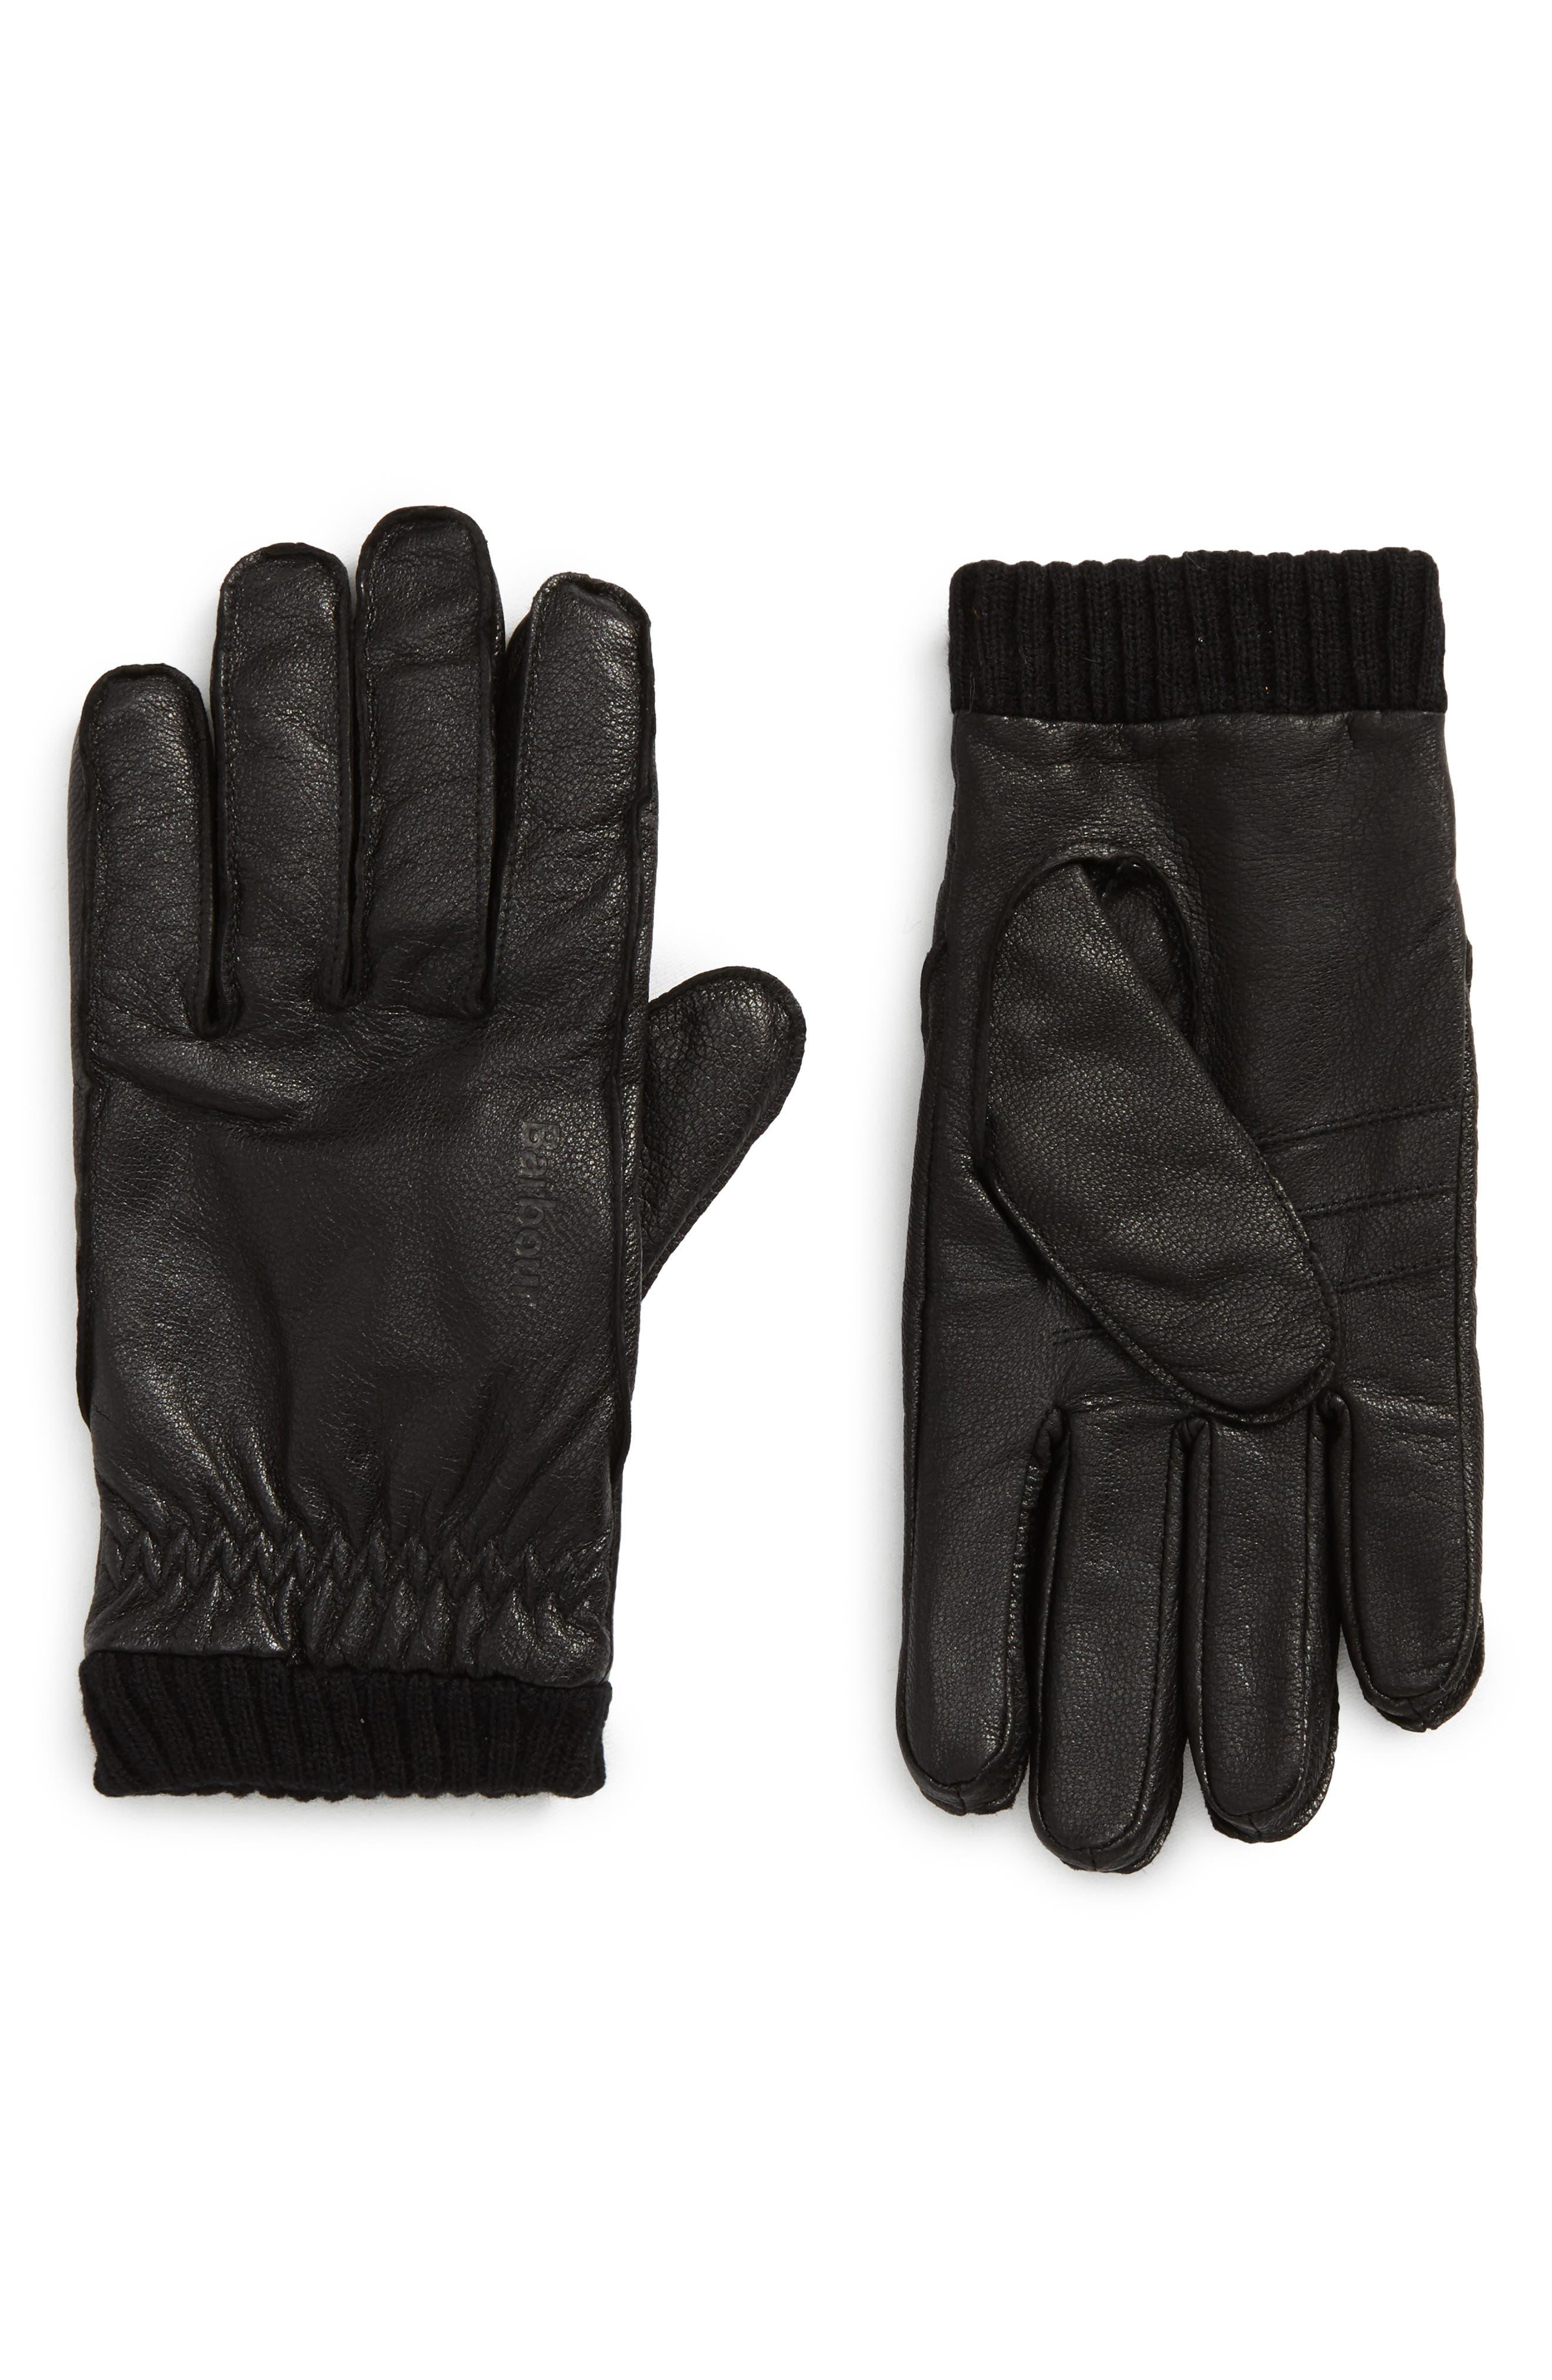 Barrow Leather Gloves,                             Main thumbnail 1, color,                             Black